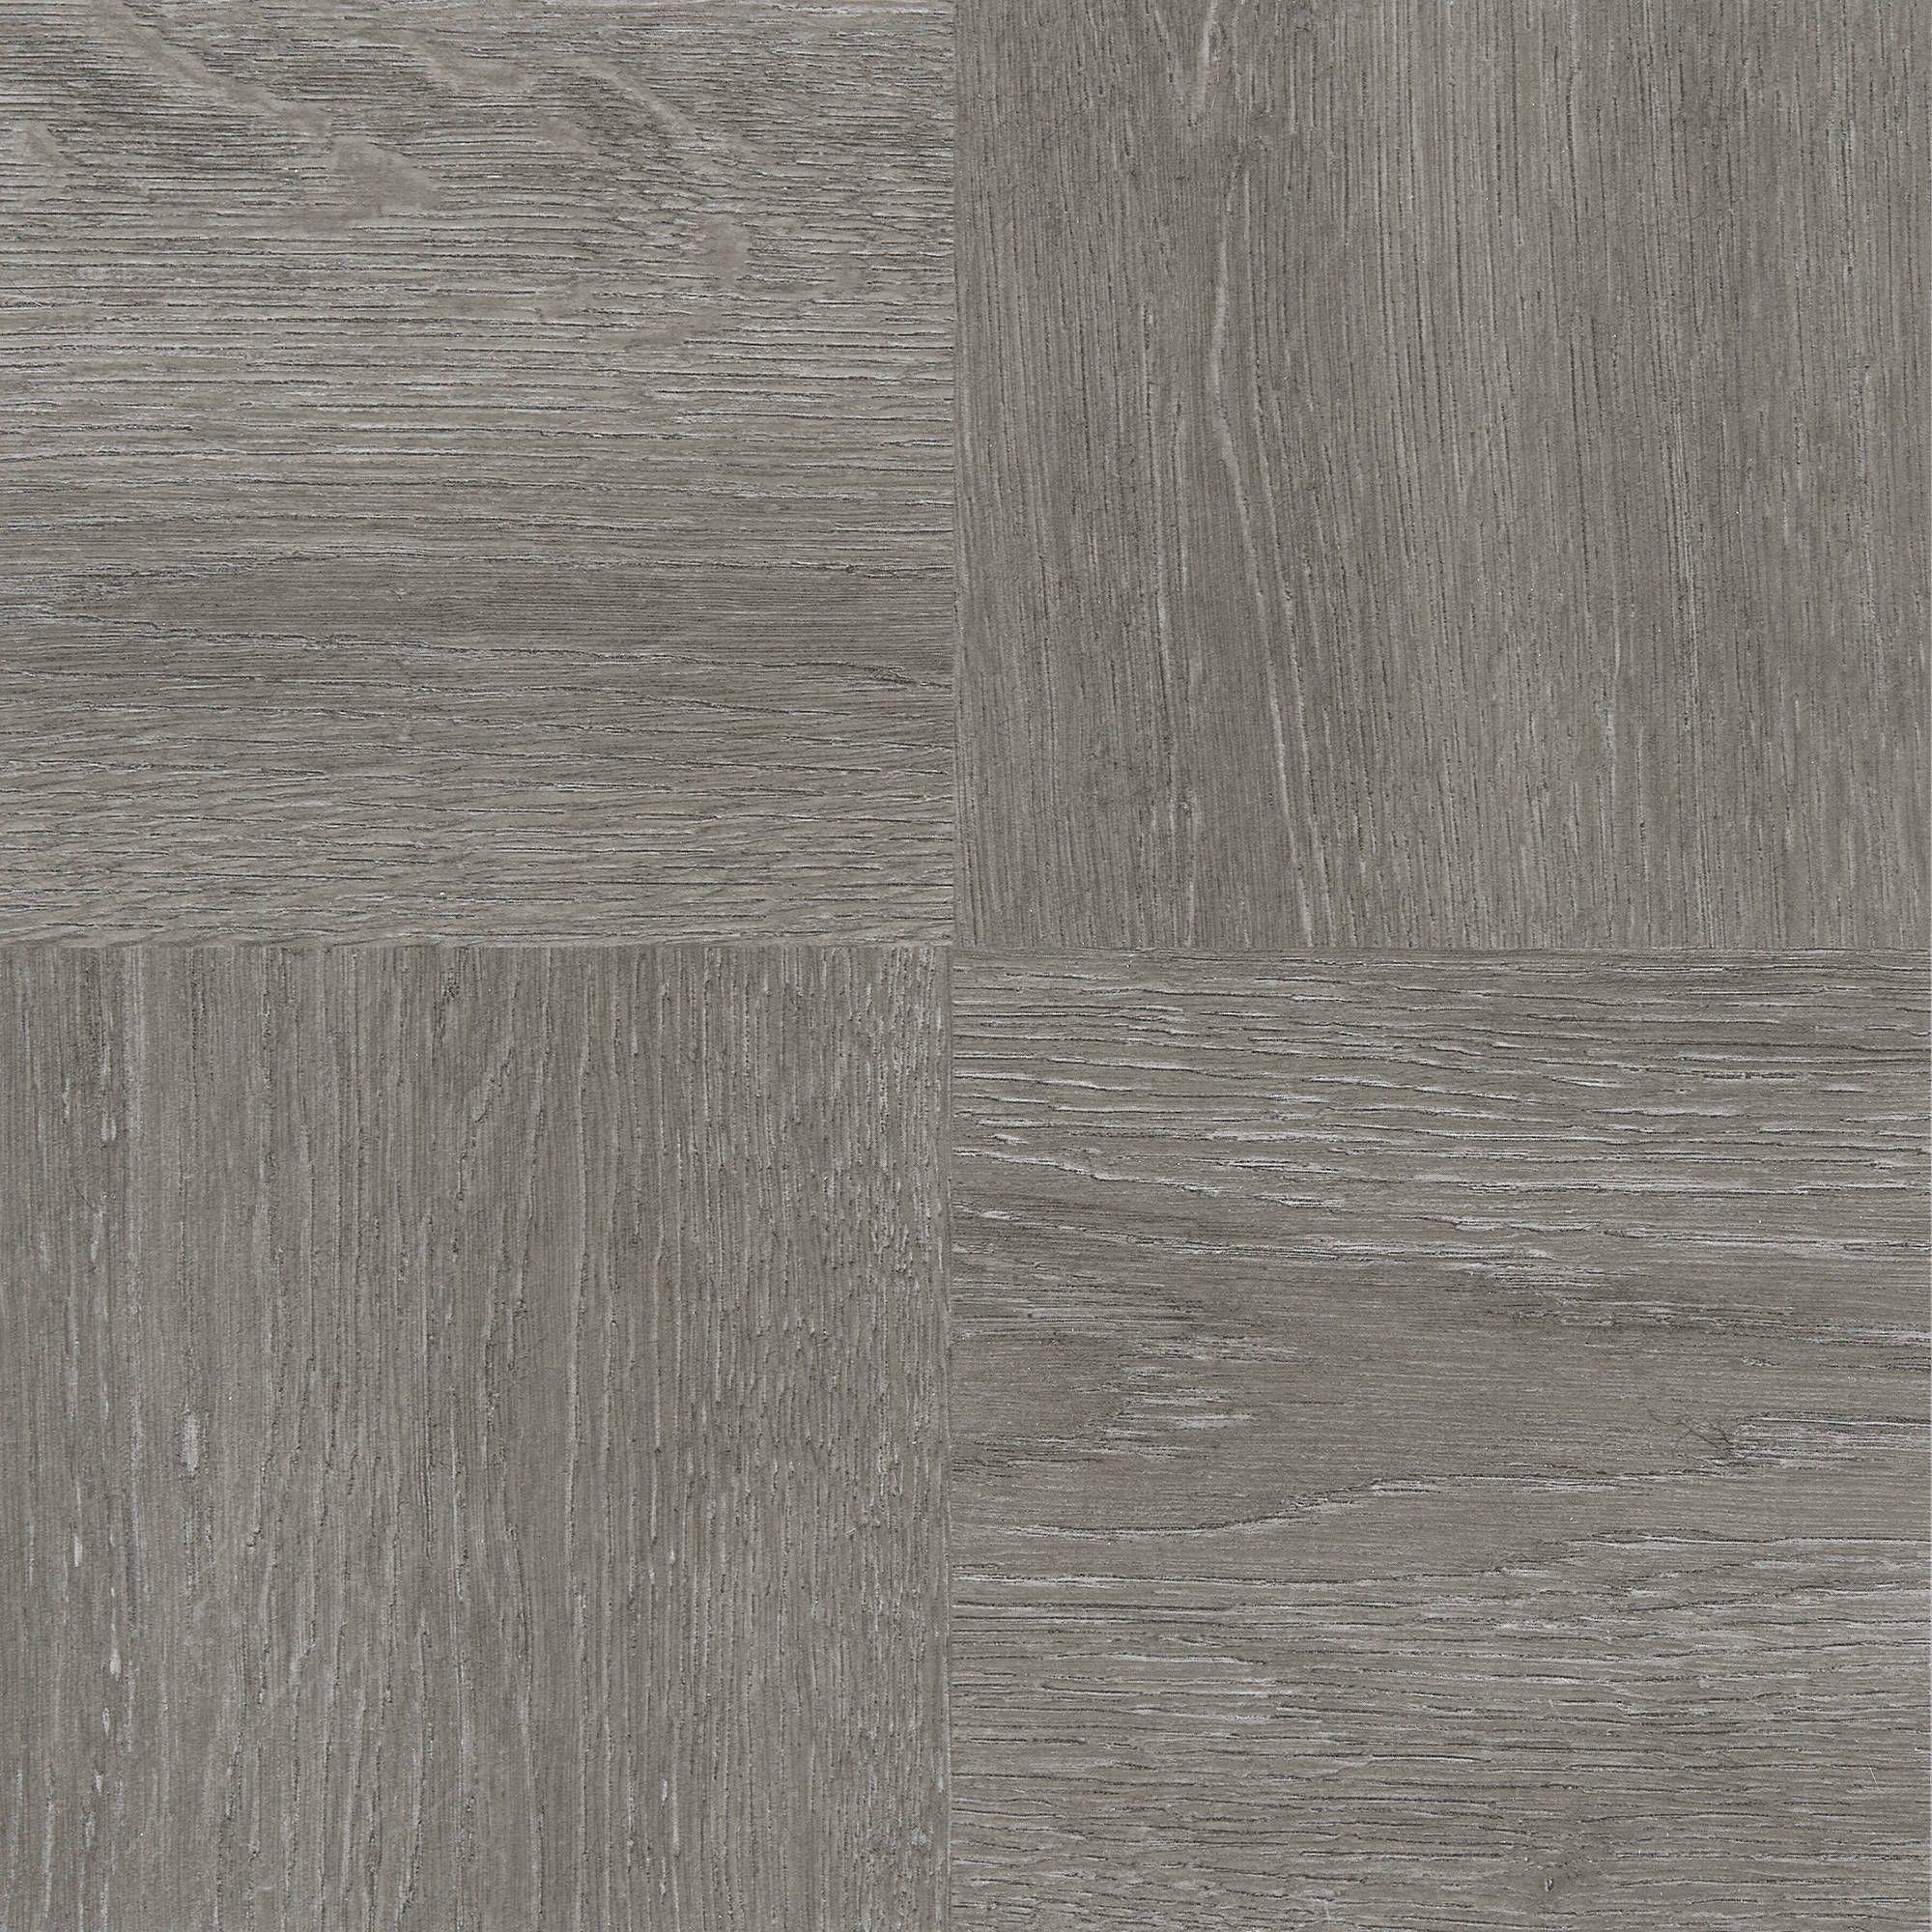 Nexus charcoal grey wood 12 x 12 self adhesive vinyl floor tile nexus charcoal grey wood 12 x 12 self adhesive vinyl floor tile dailygadgetfo Image collections